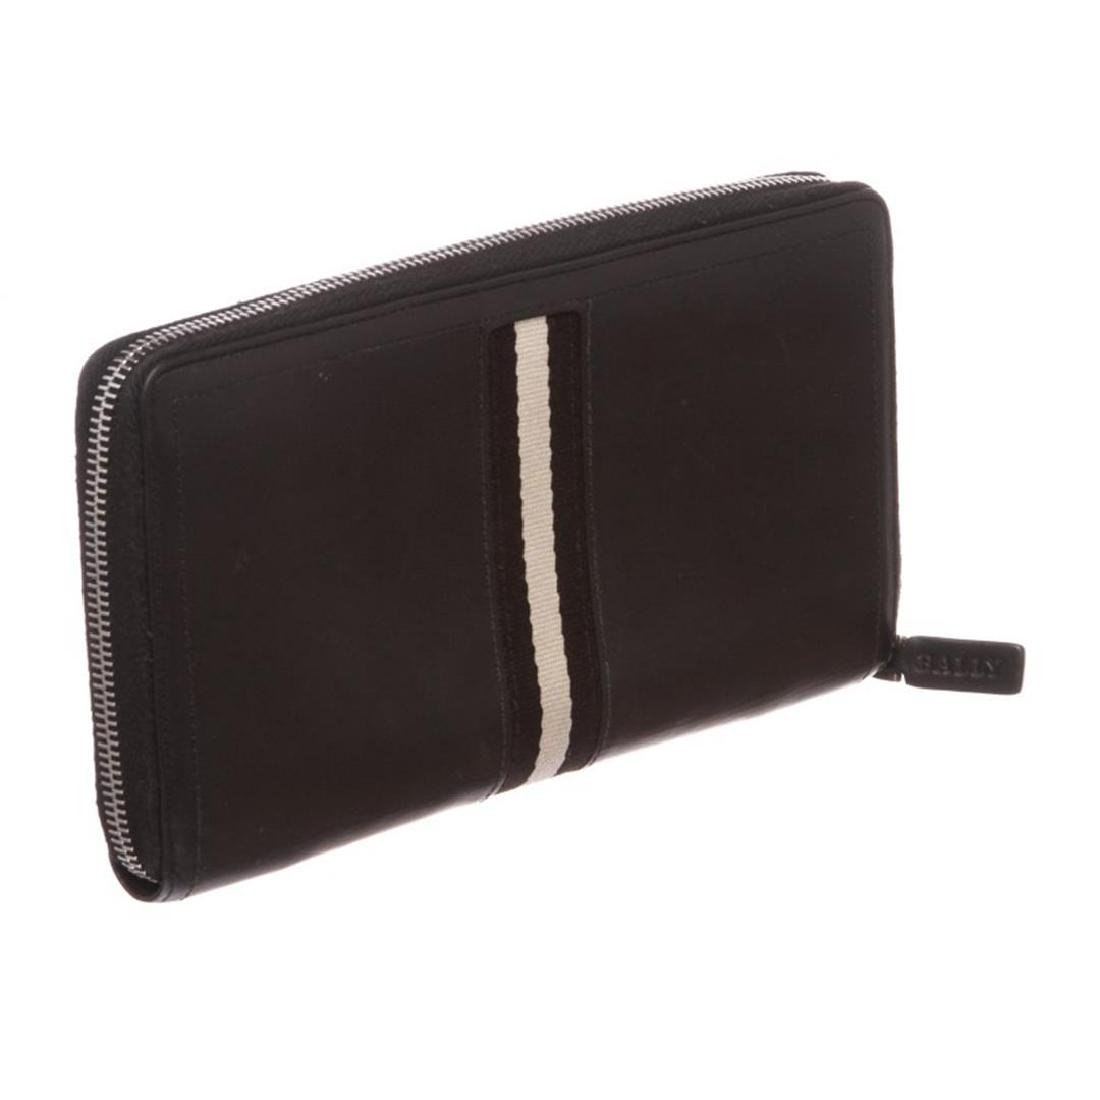 Bally Black Leather Long Zipper Wallet - 3